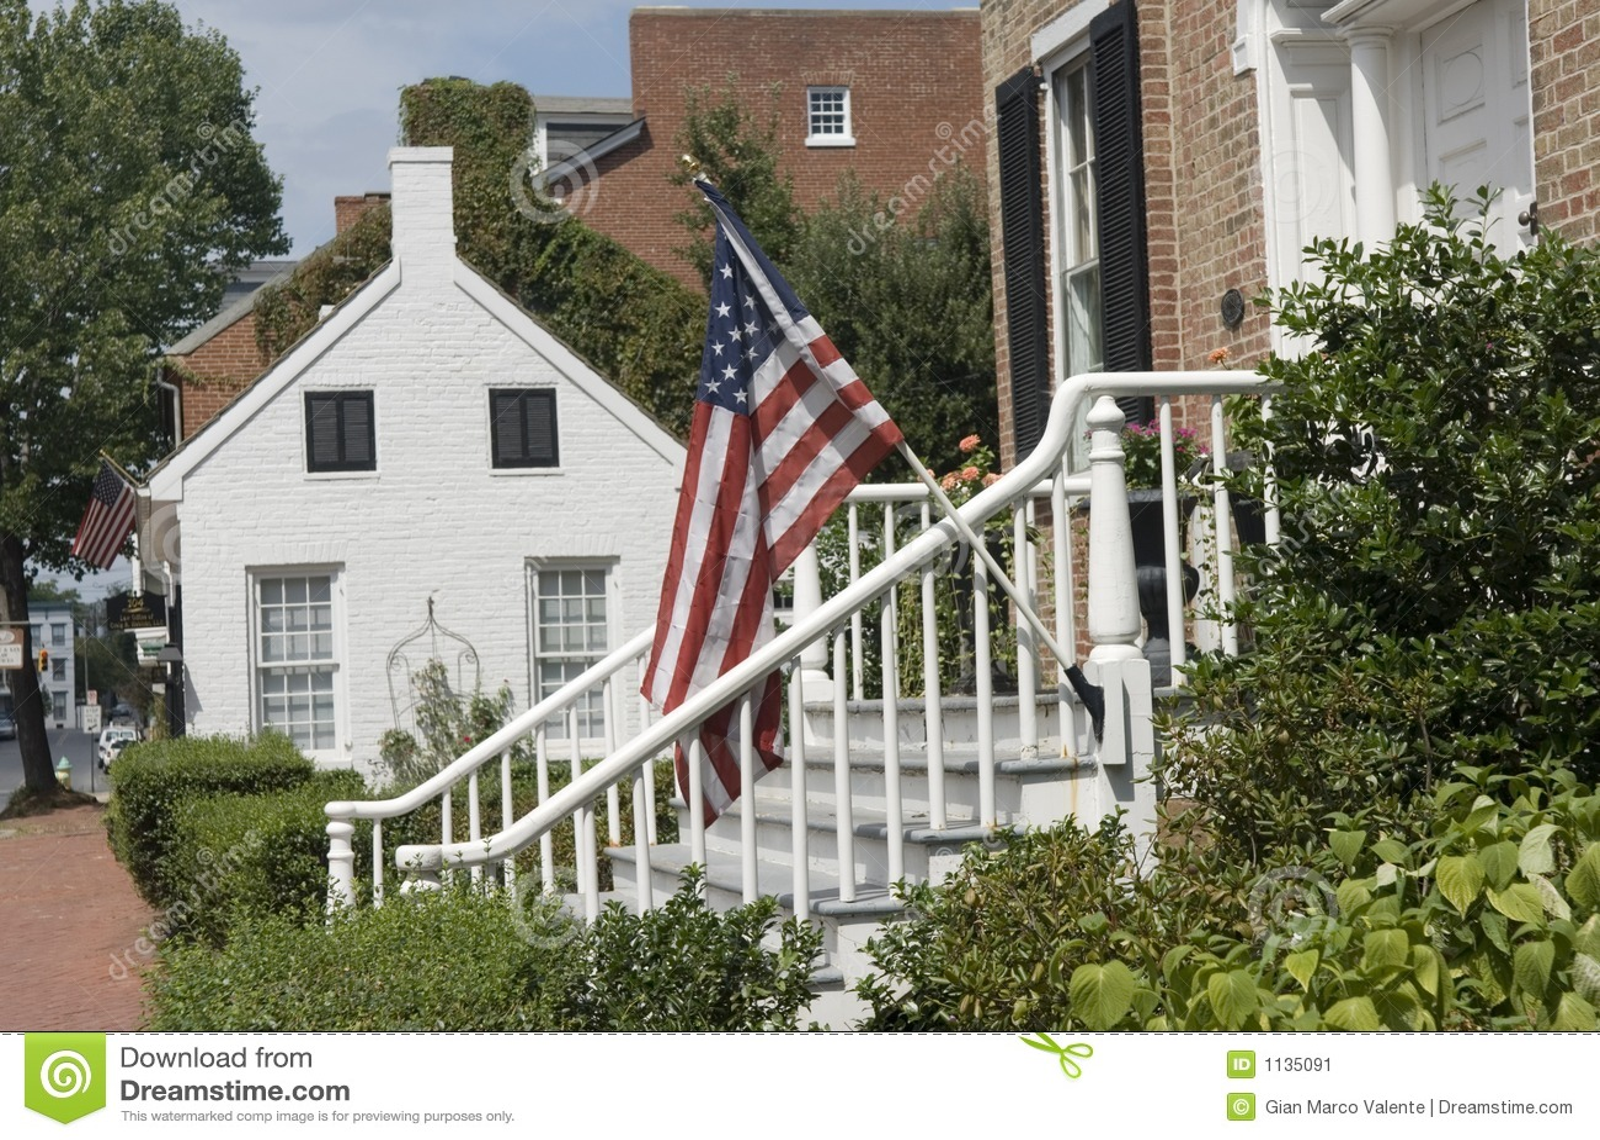 Case storiche in Frederick, Maryland.